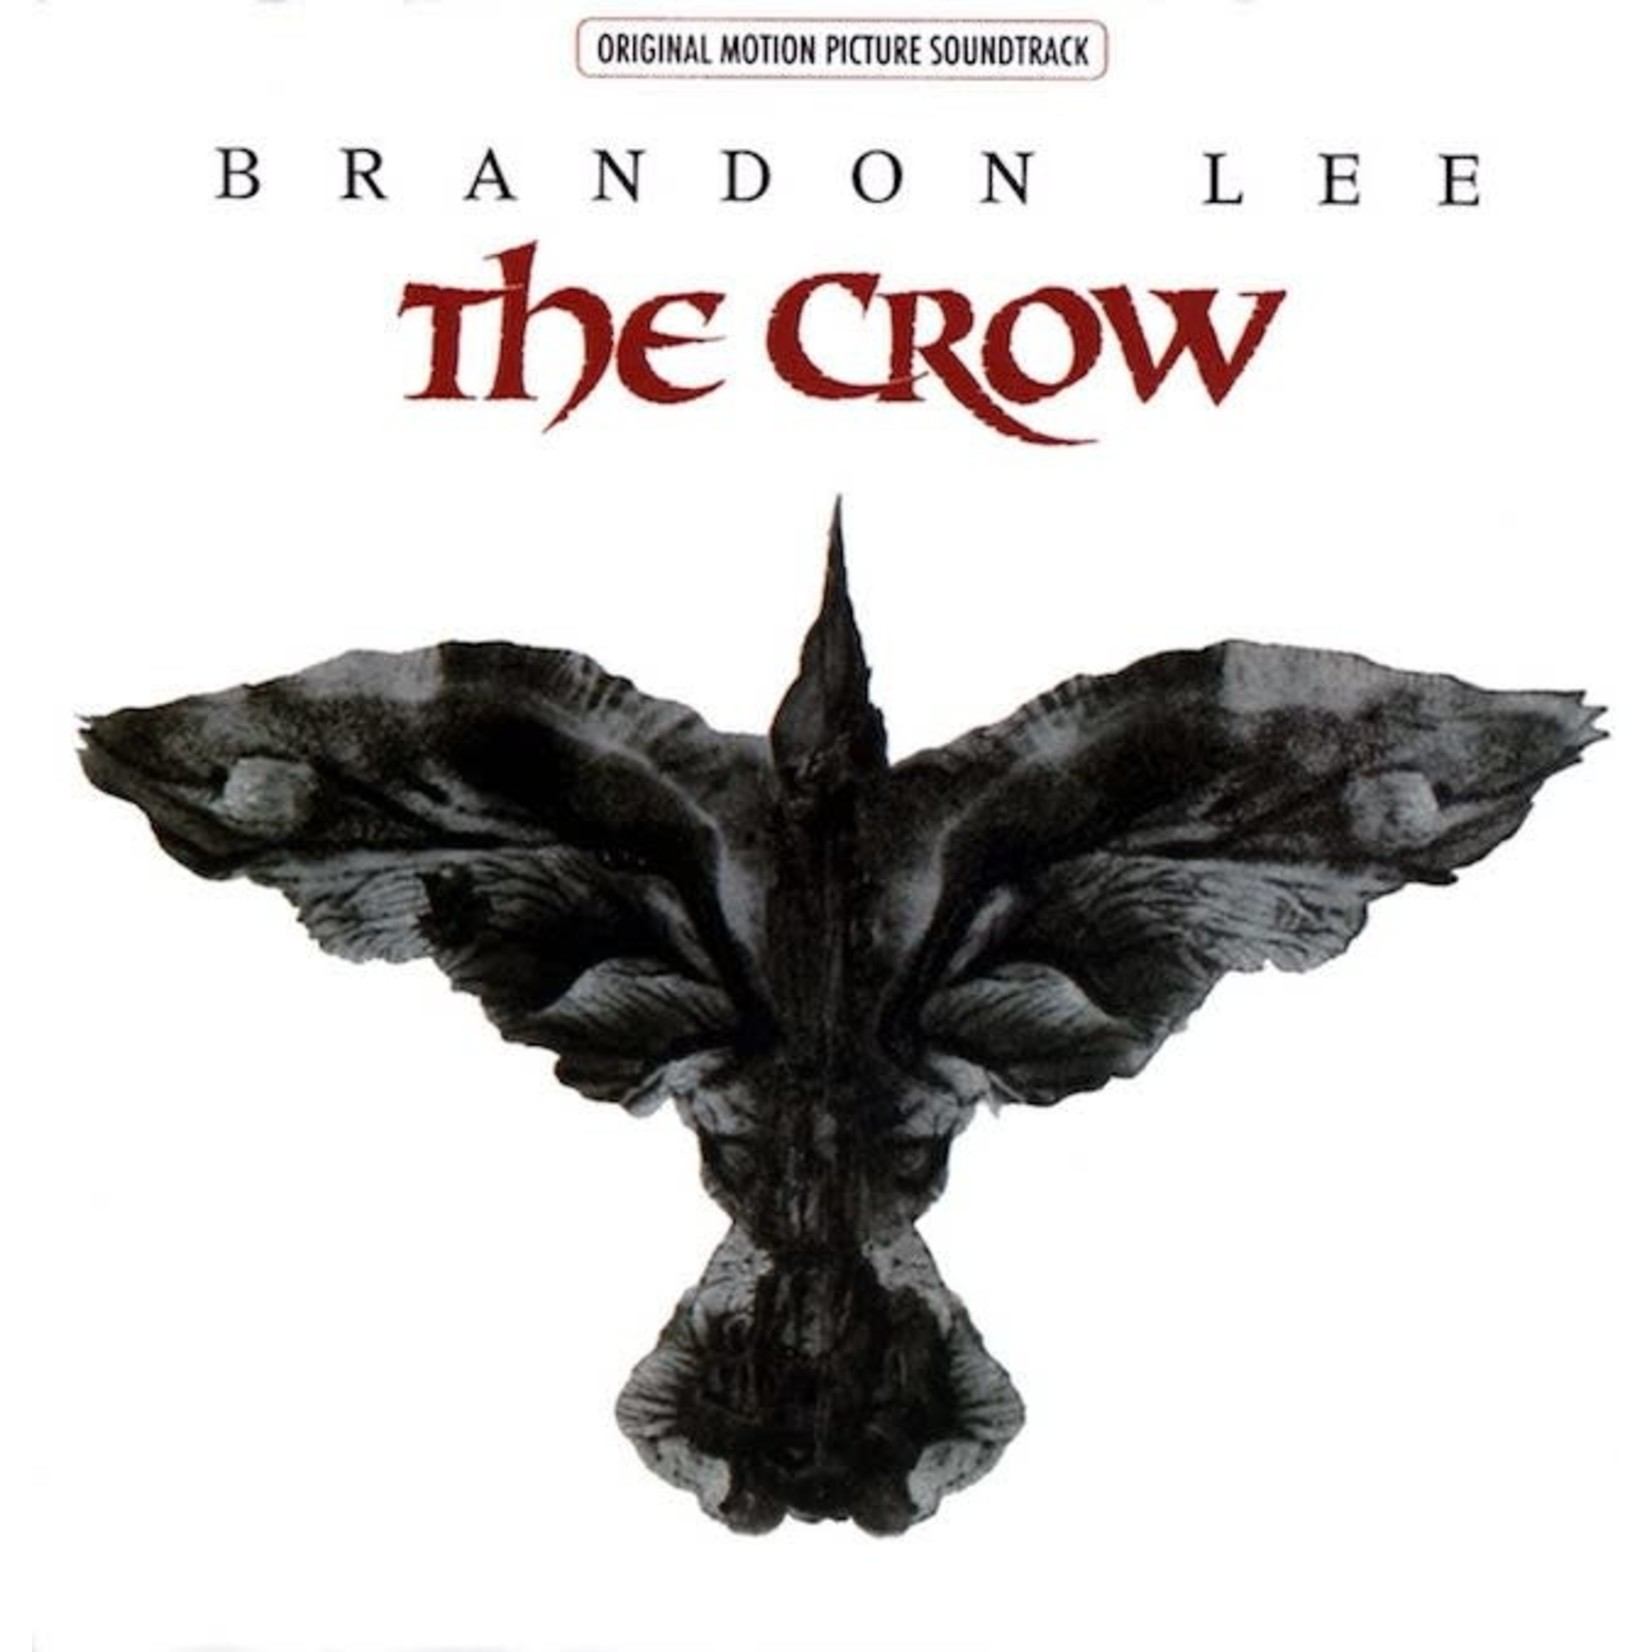 [New] Various: The Crow (soundtrack) (Rocktober 2020) [ATLANTIC/RHINO]